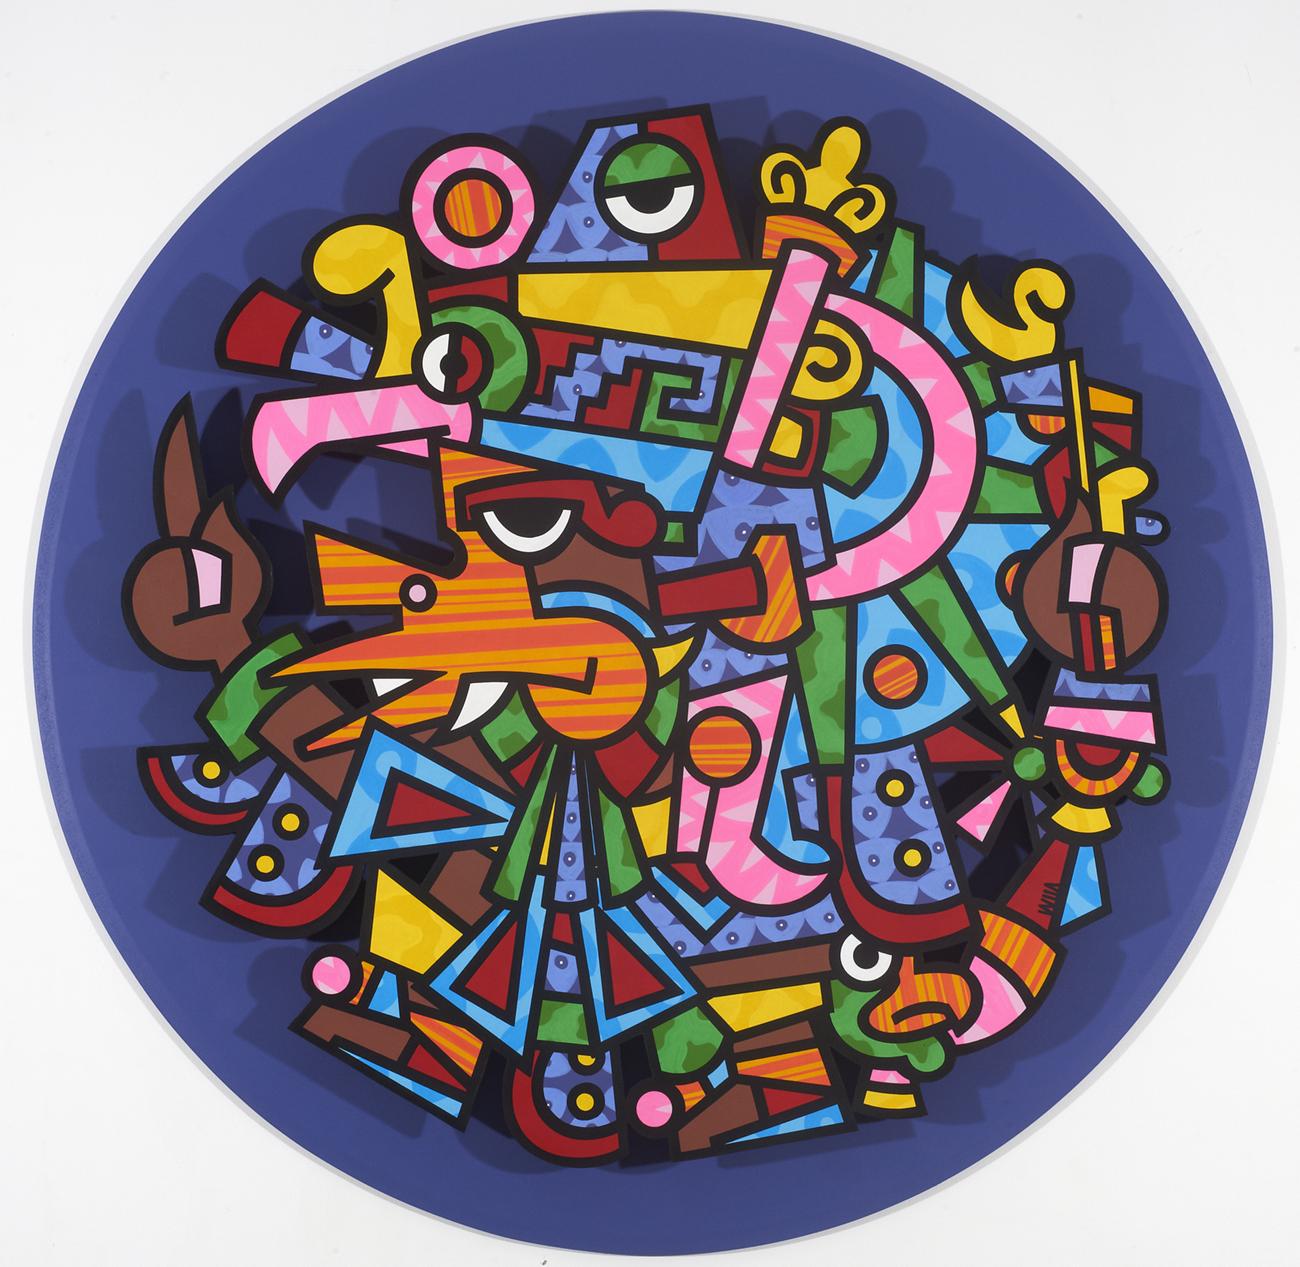 Fernando Davila - America Perdida cercle violet